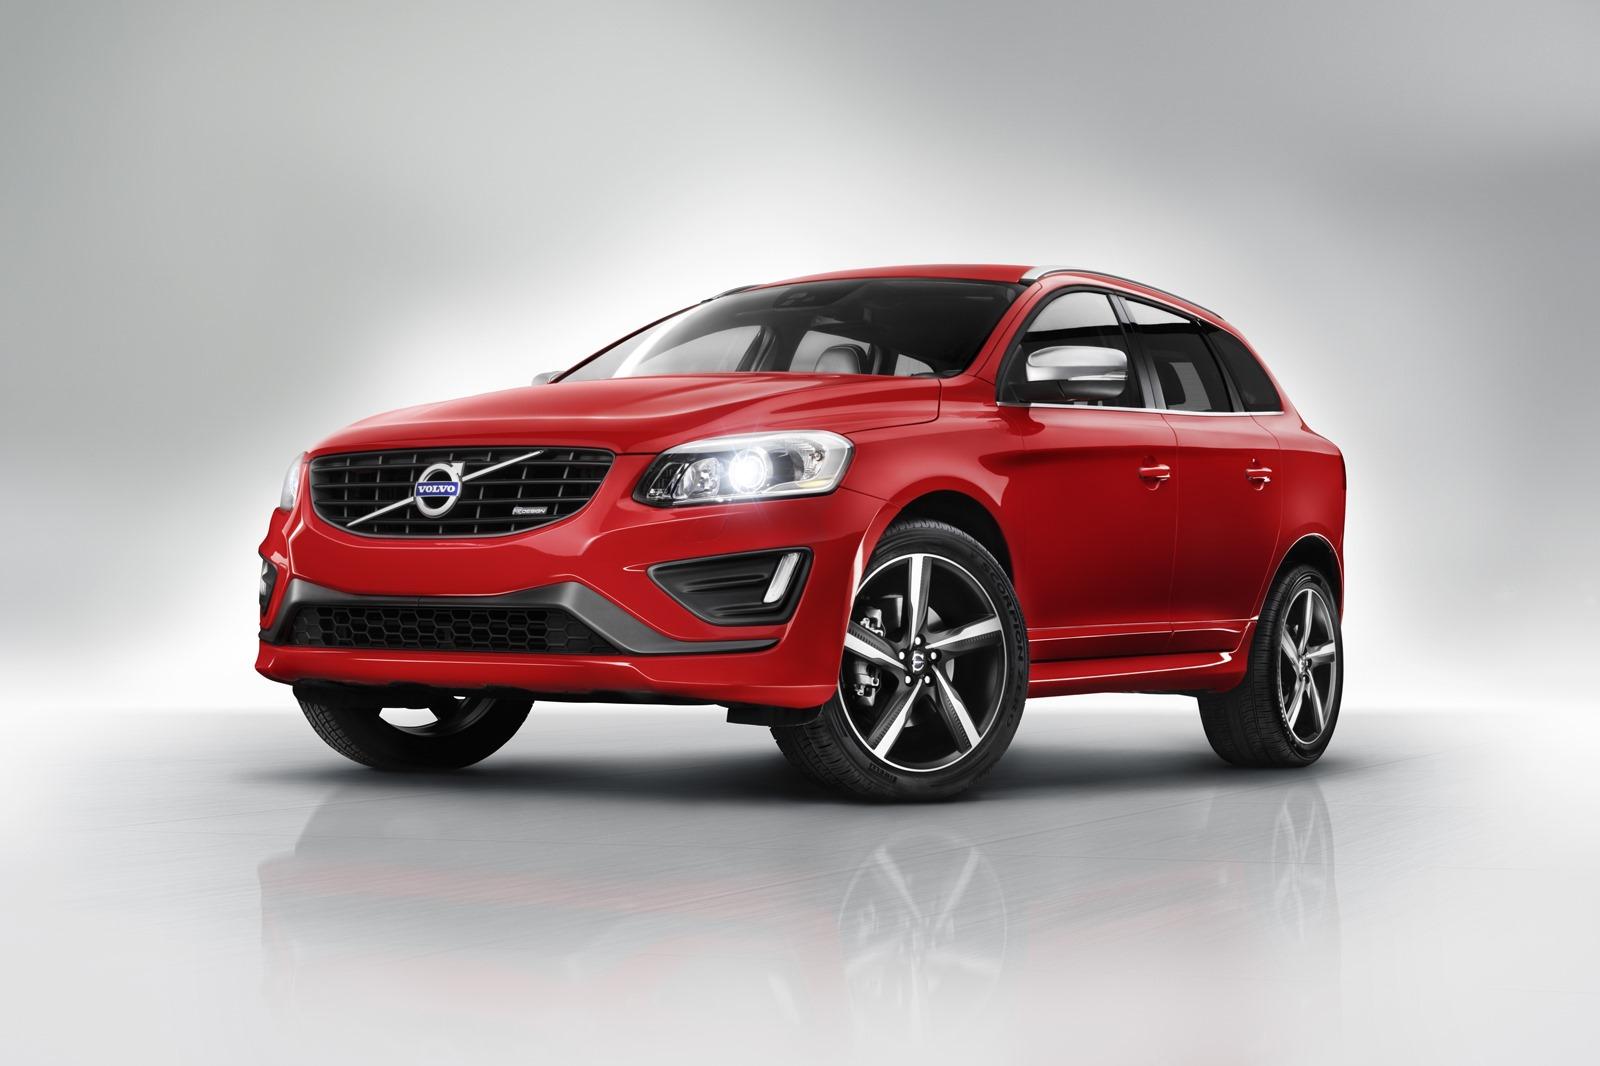 Volvo XC60 Restyling (2014) 12